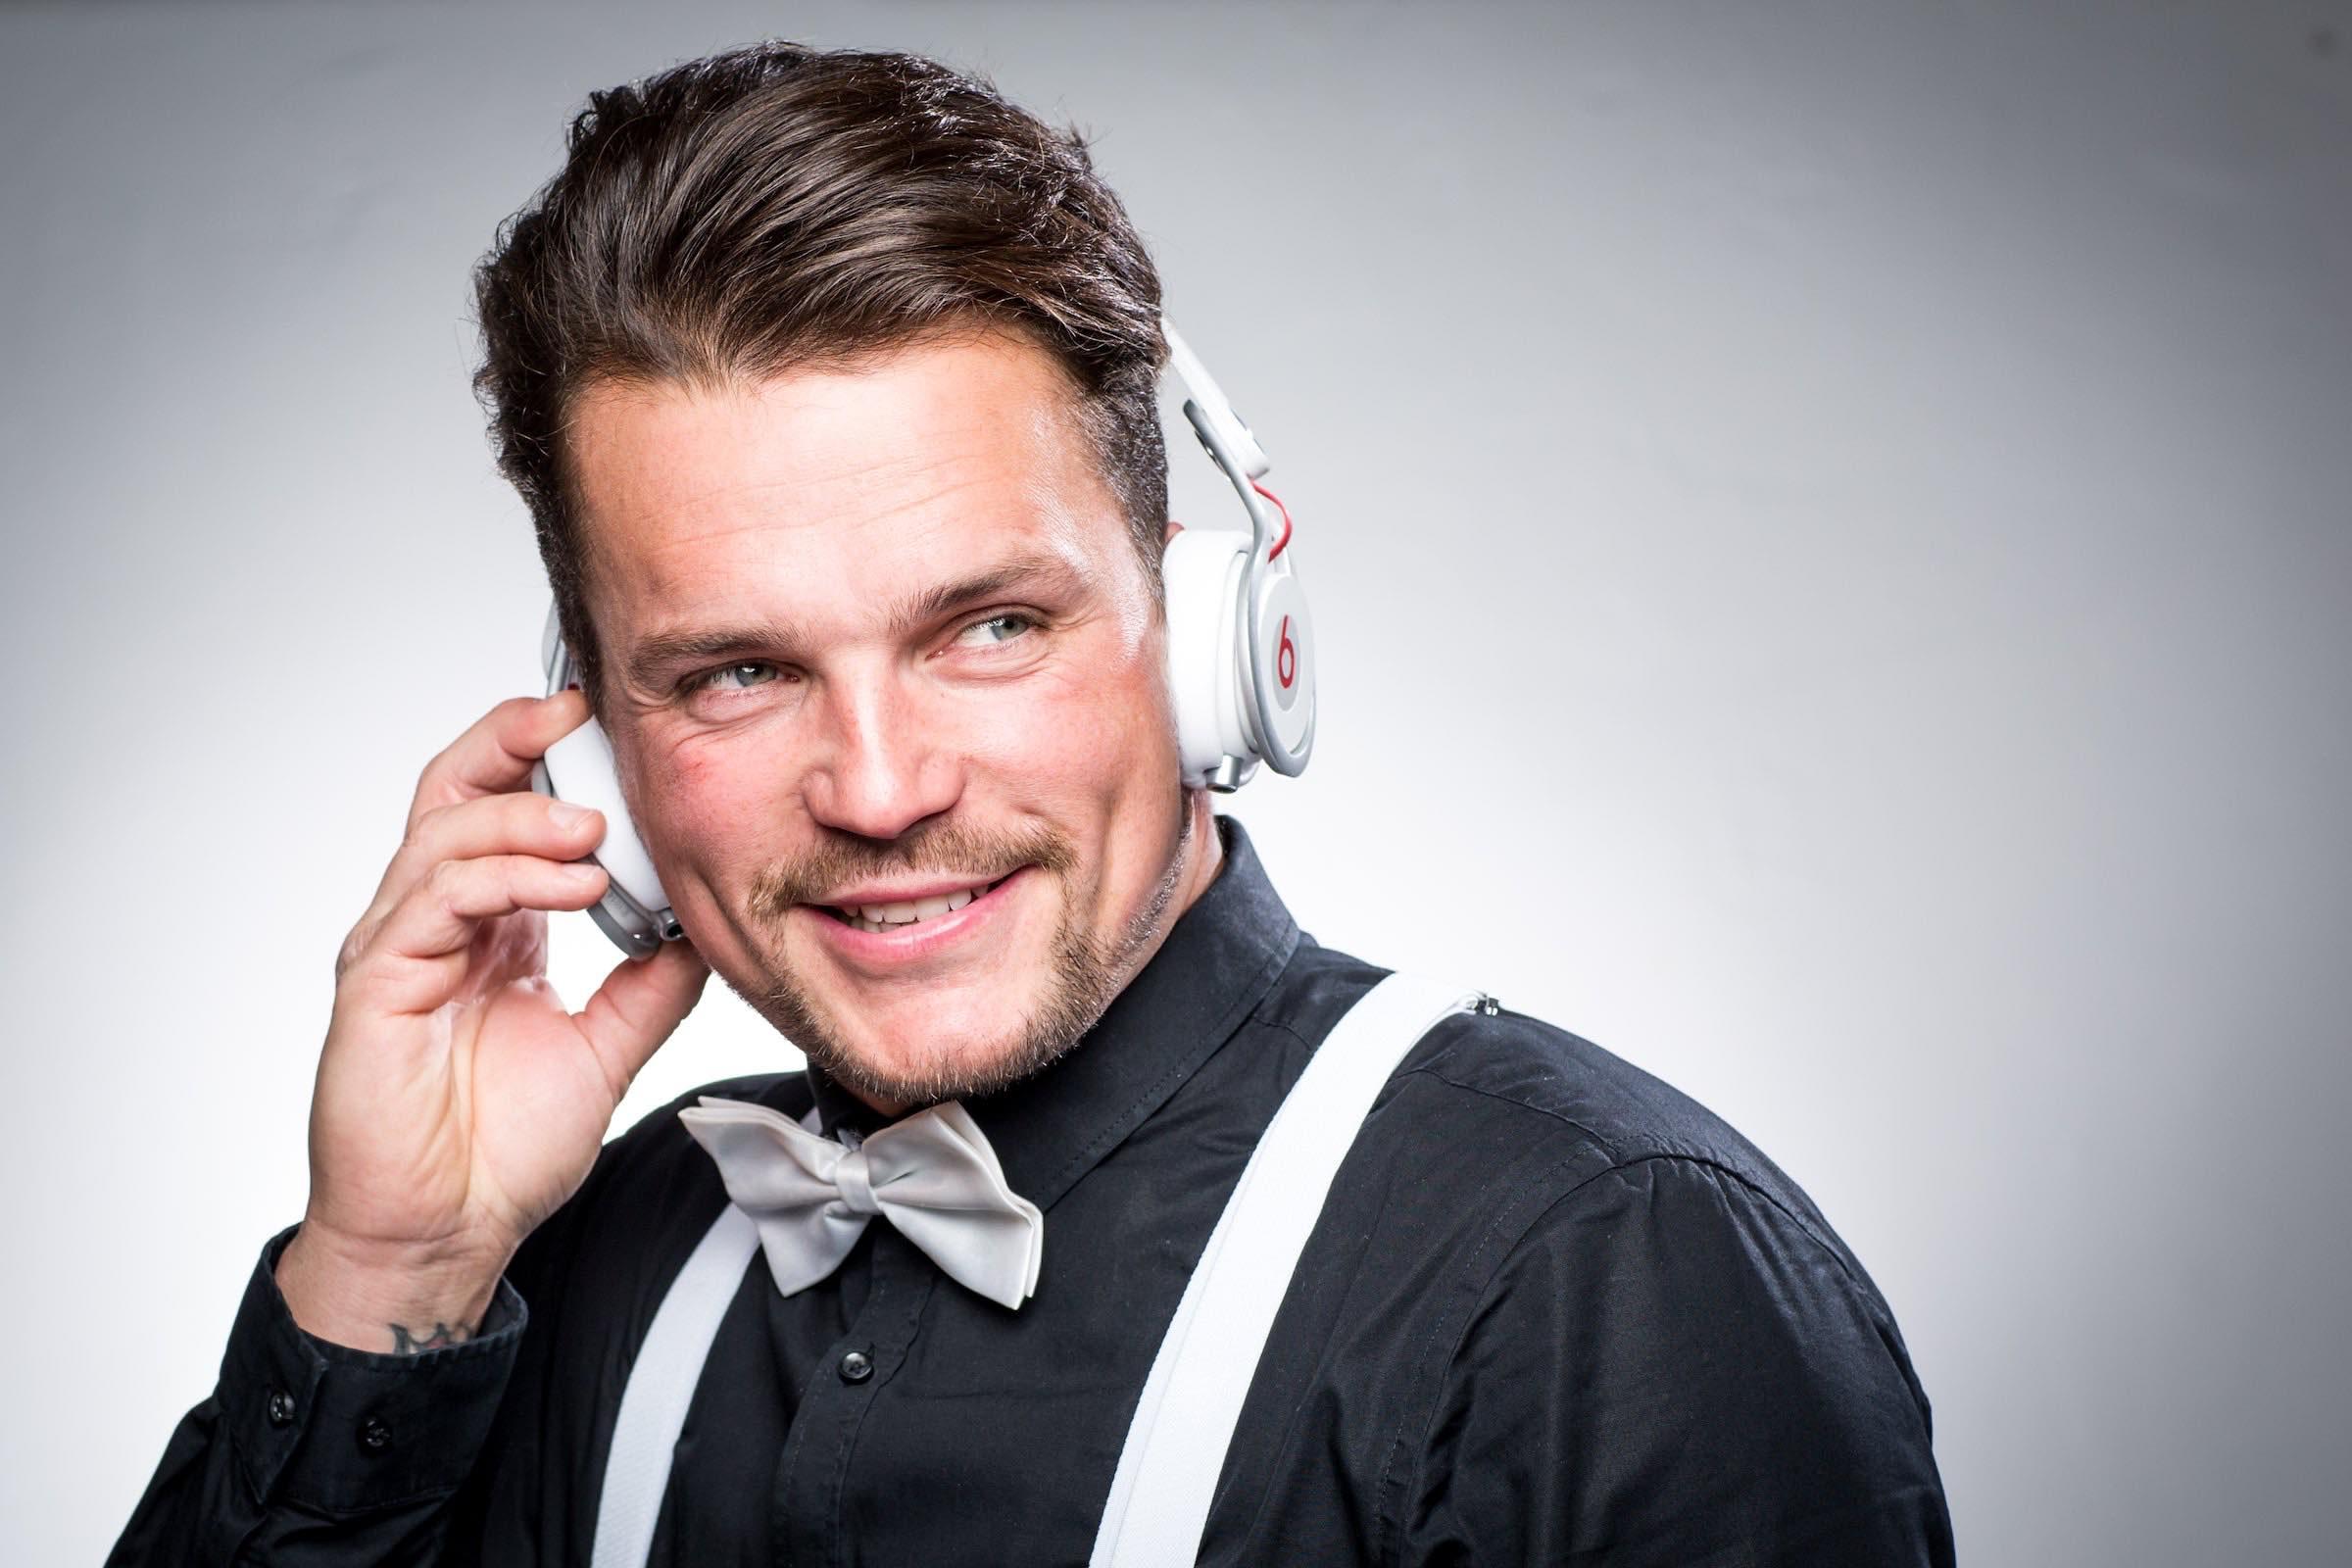 Hochzeits | DJ | Buchen | Hamburg | Marco | Kern | DJ | Hochzeit | Messe | DJ | Event | DJ | Geburtstag | DJ | Betriebsfeier | DJ | Buchen | Discjockey | Mieten | DJ | Agentur | Hamburgfeiert